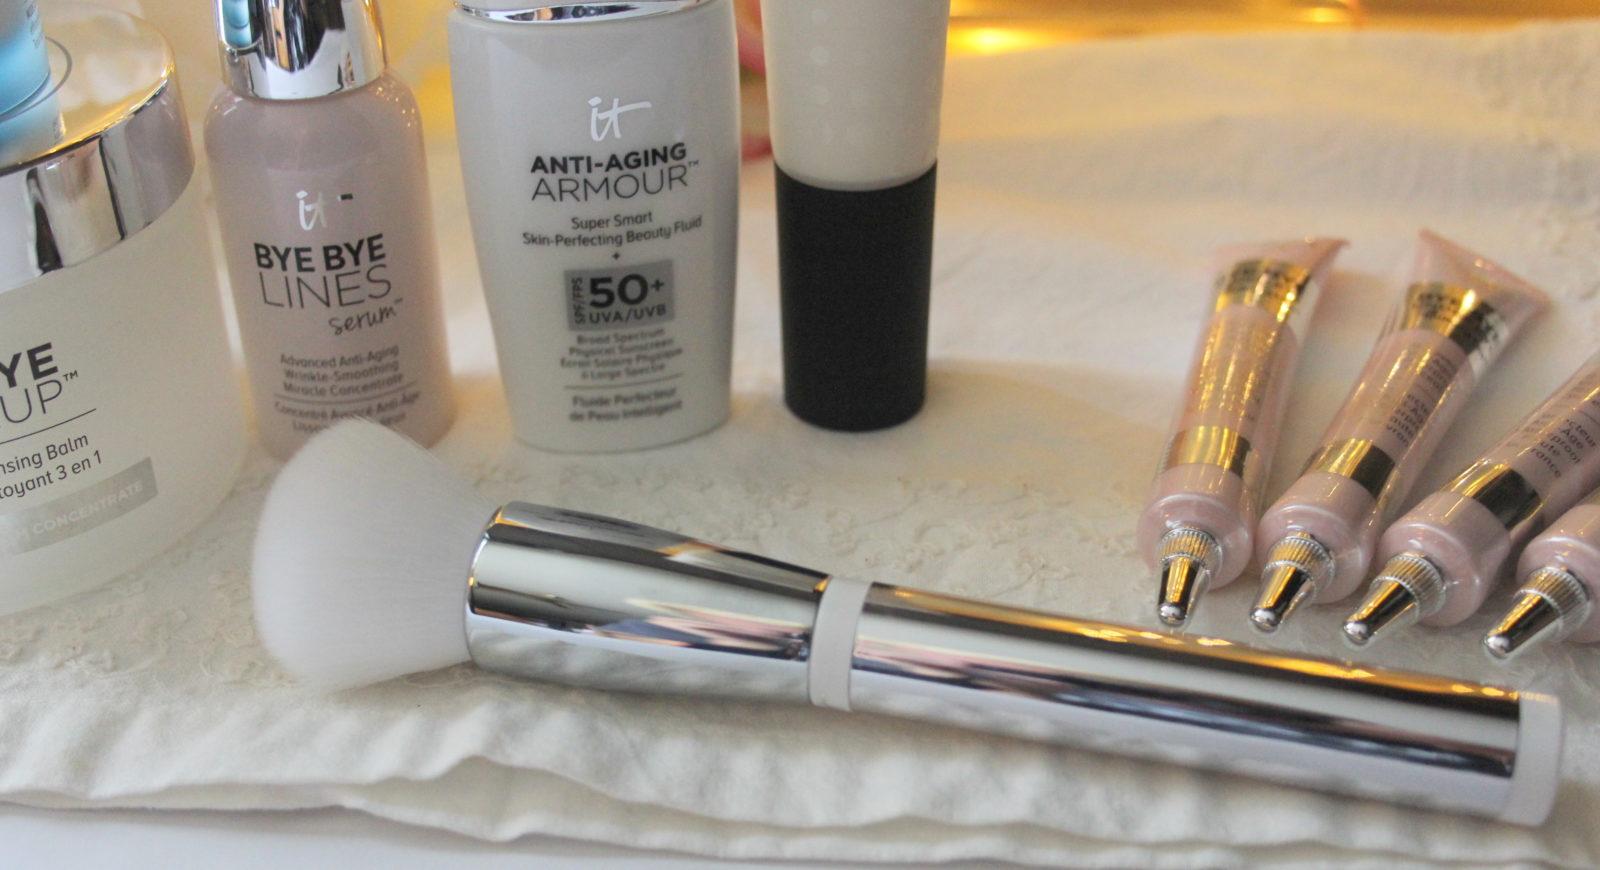 It Cosmetics 702 Brush